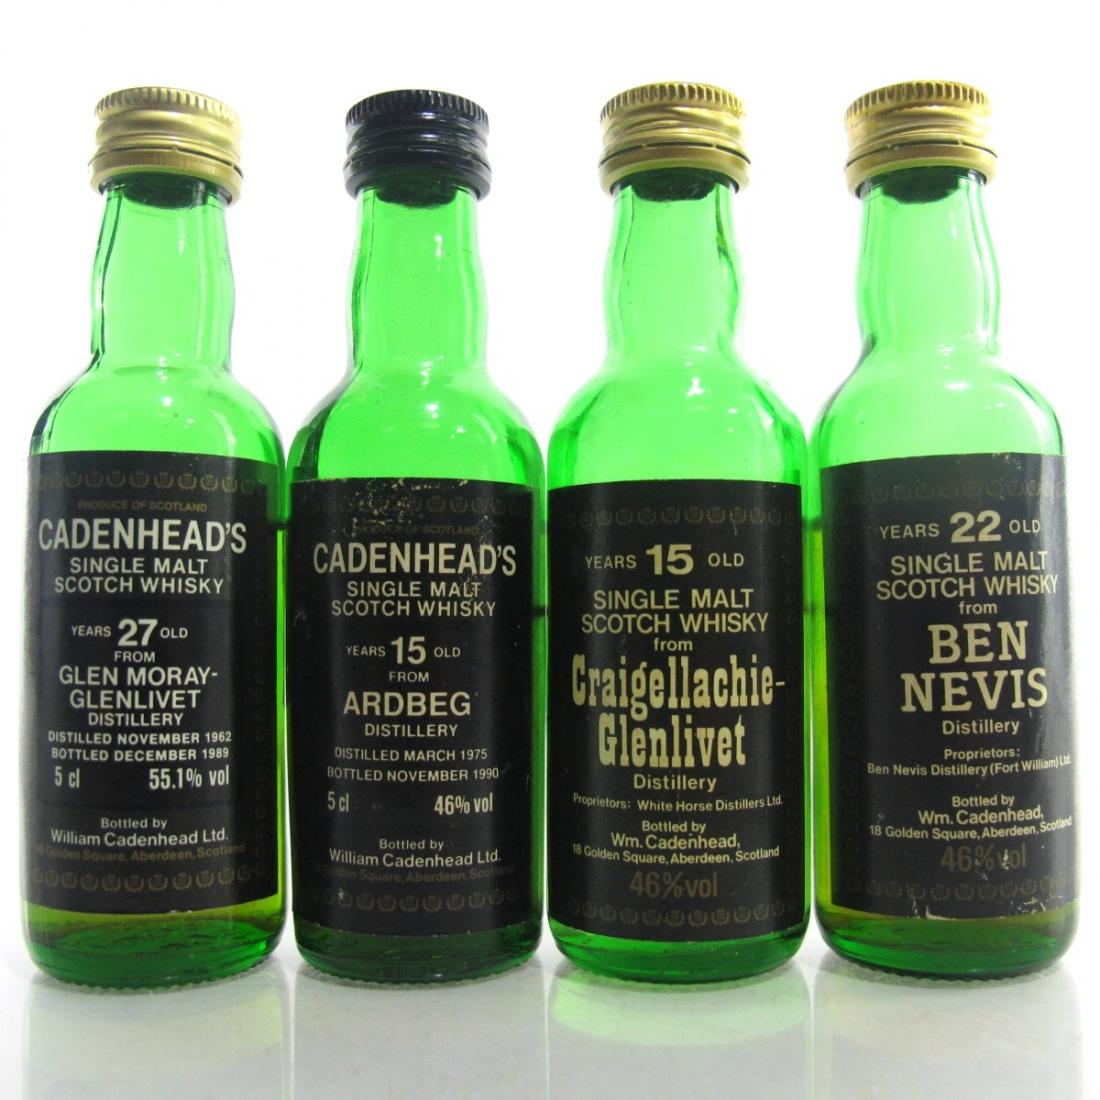 Cadenhead's Miniature Selection x 4 1980s / includes Ardbeg 1975